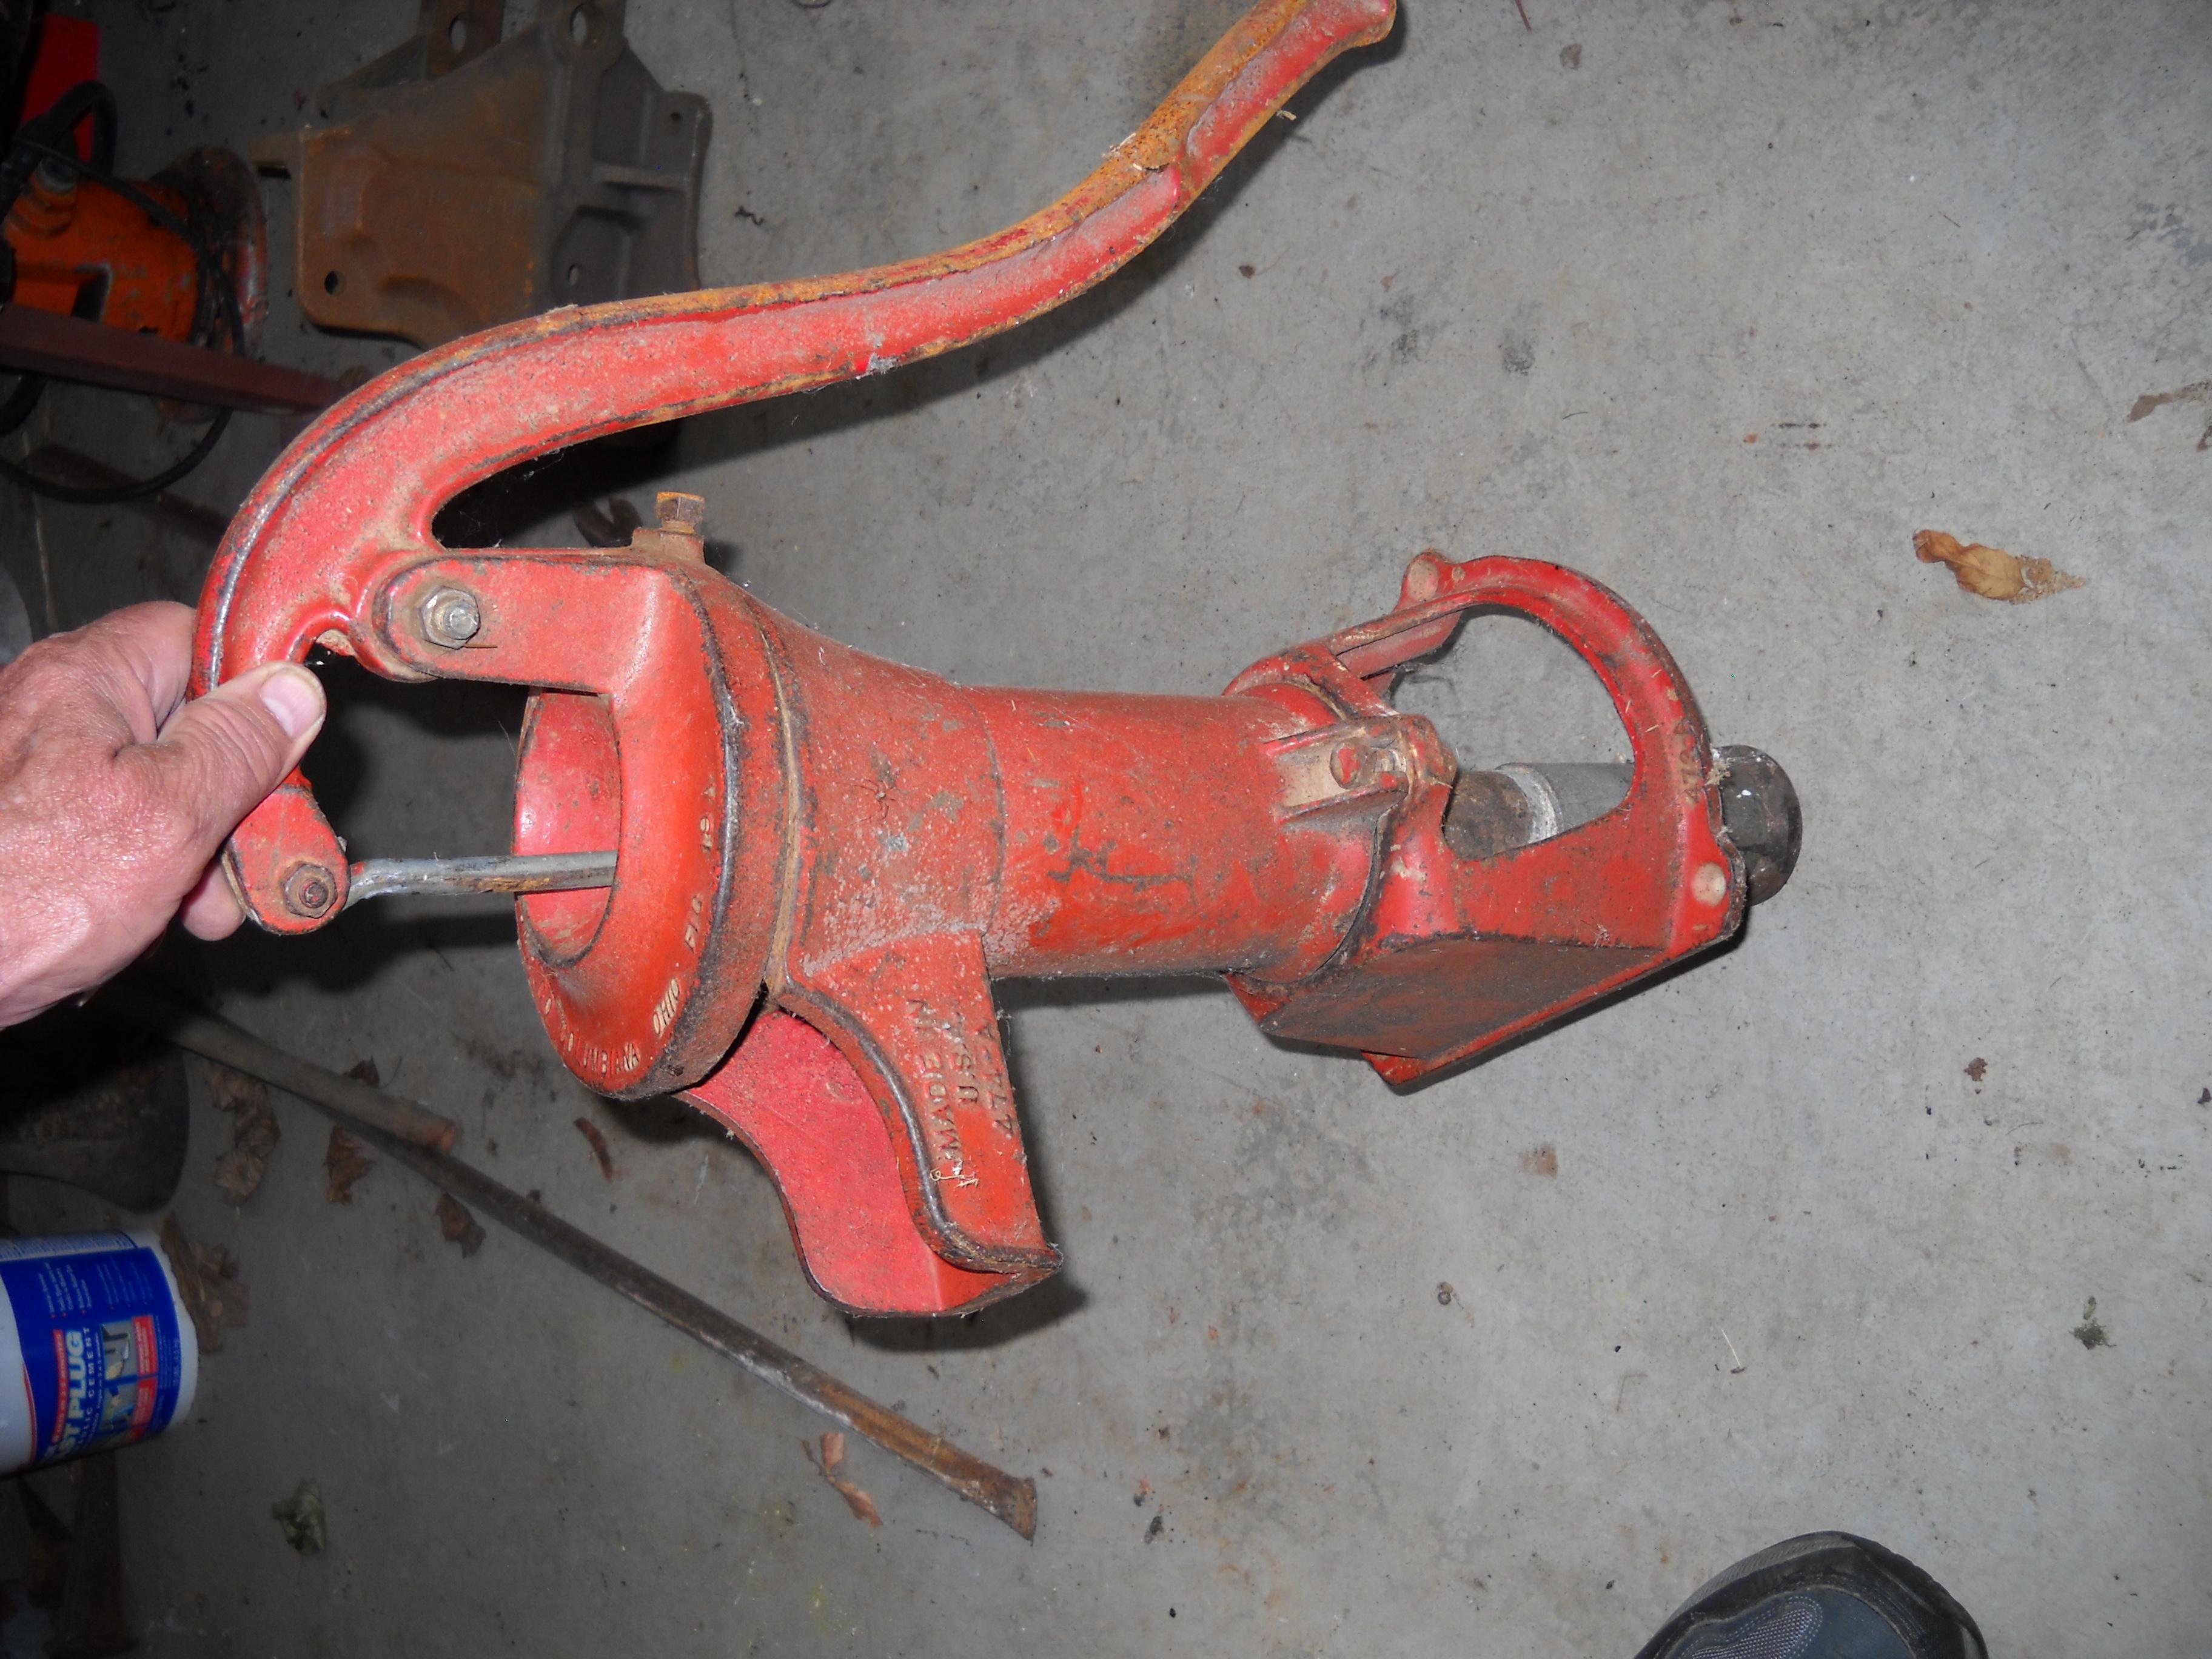 Antique Pitcher Pump - Image Antique and Candle Victimassist.Org